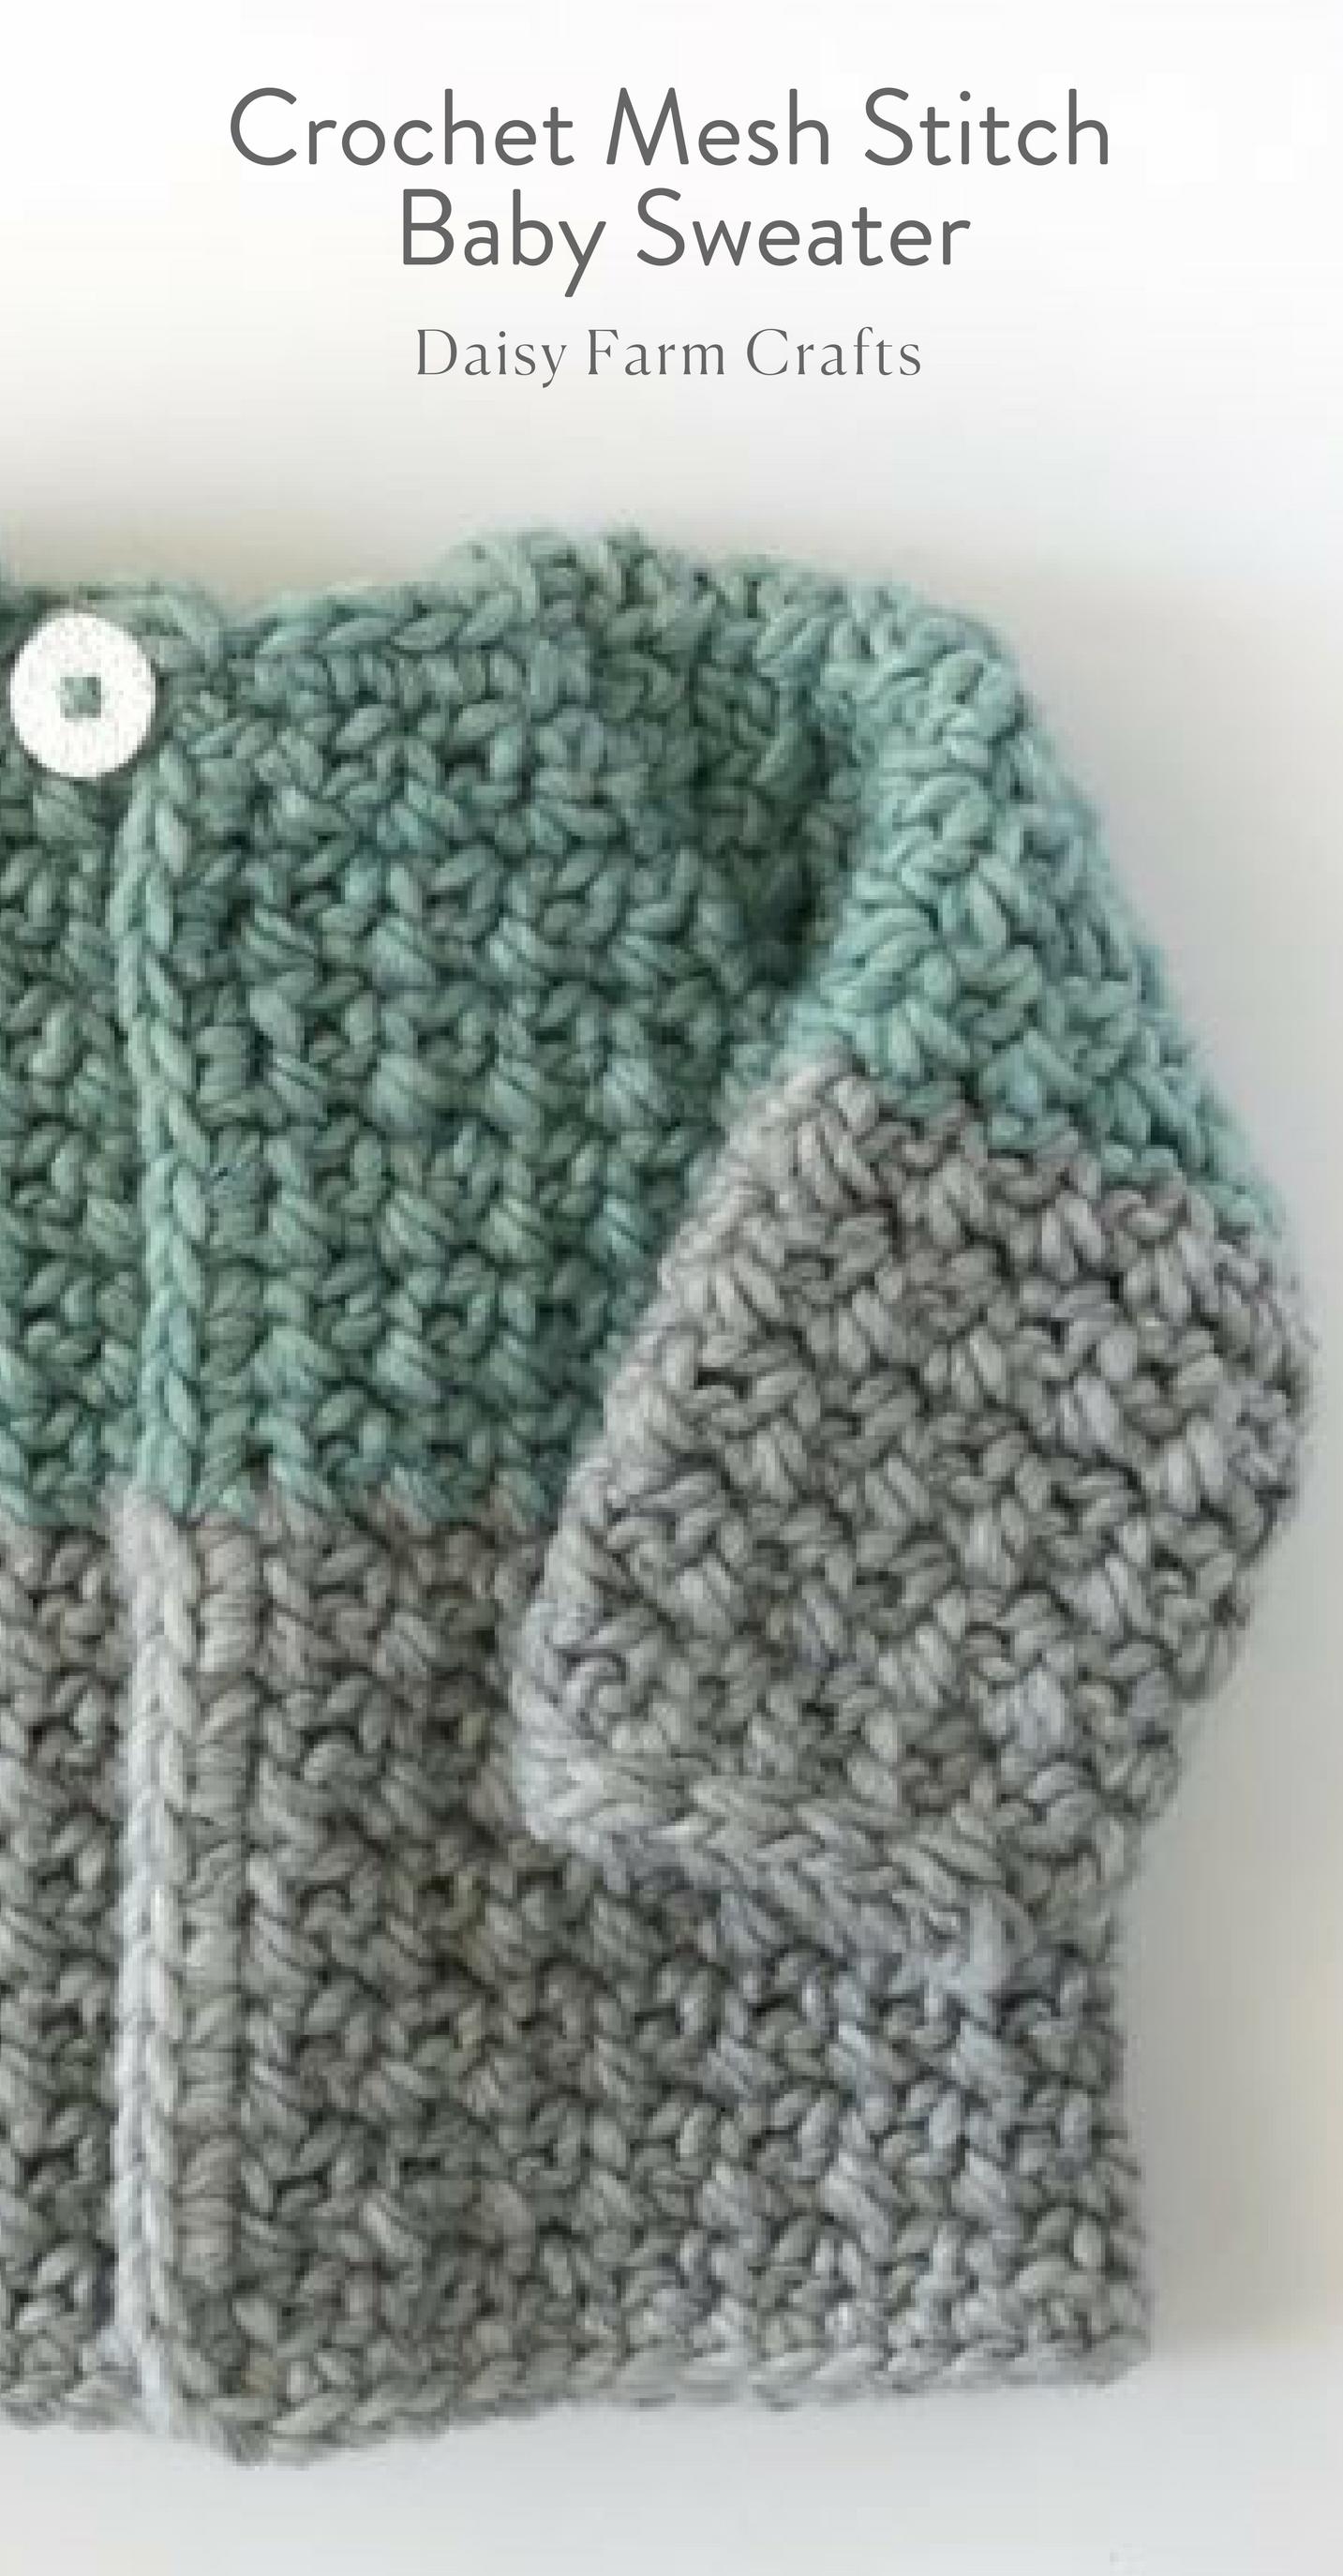 Free Pattern - Crochet Mesh Stitch Baby Sweater | Children crochet ...